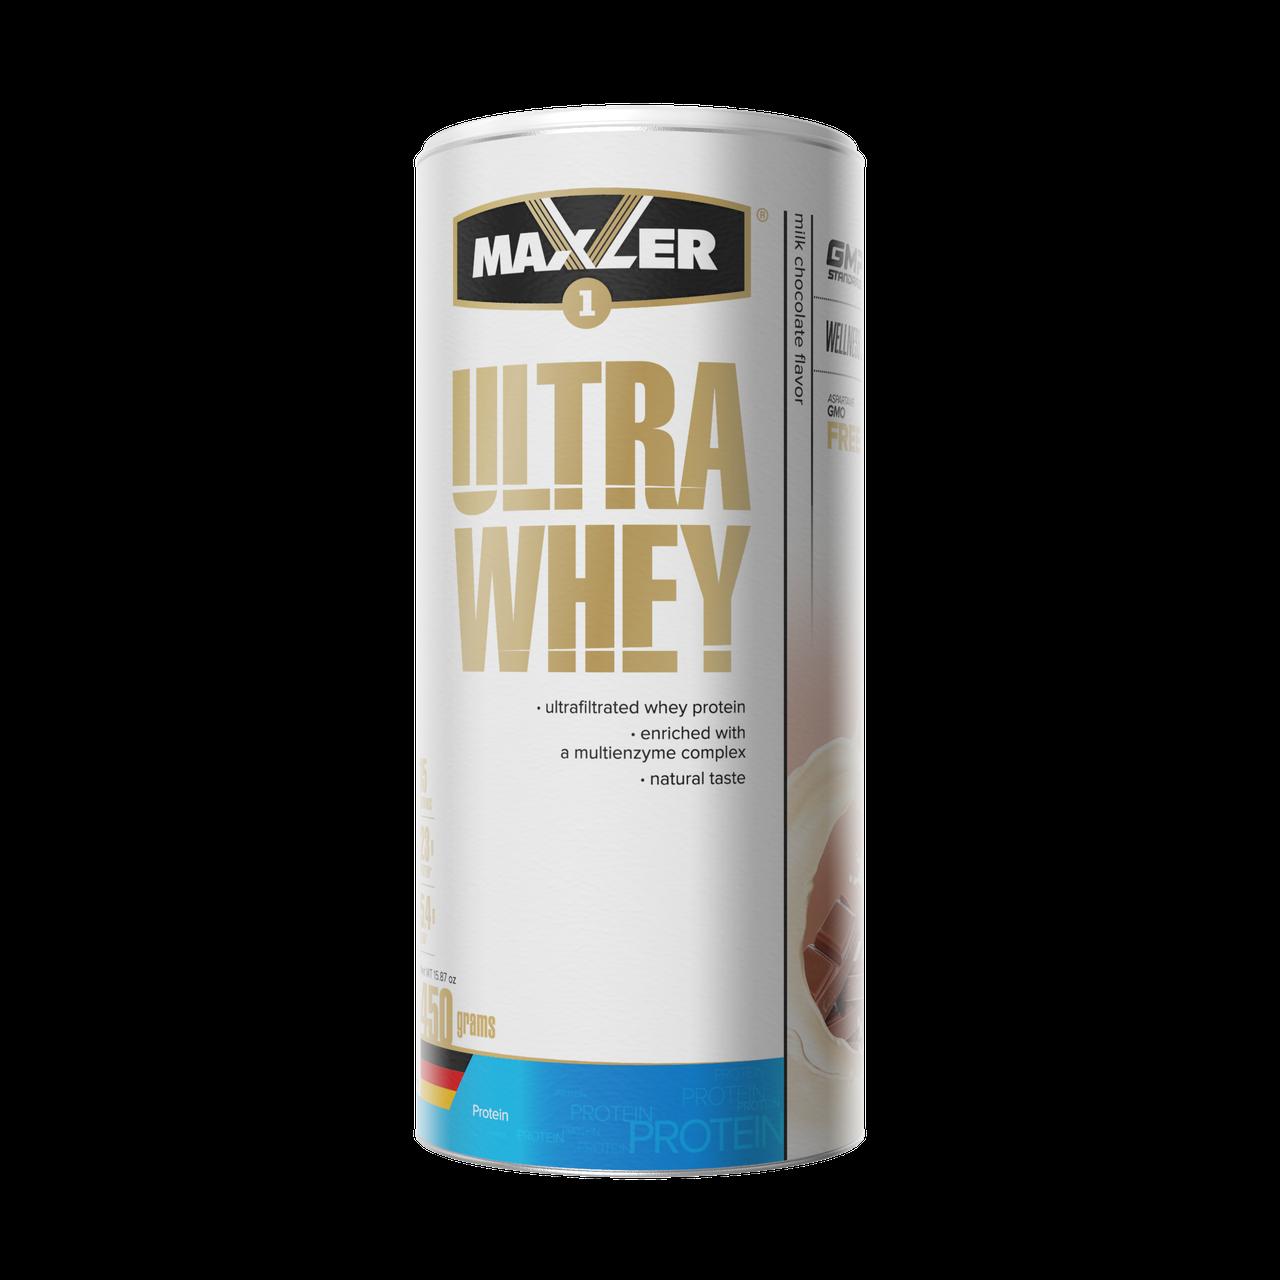 Max_Ultra Whey 450g - milk chocolate